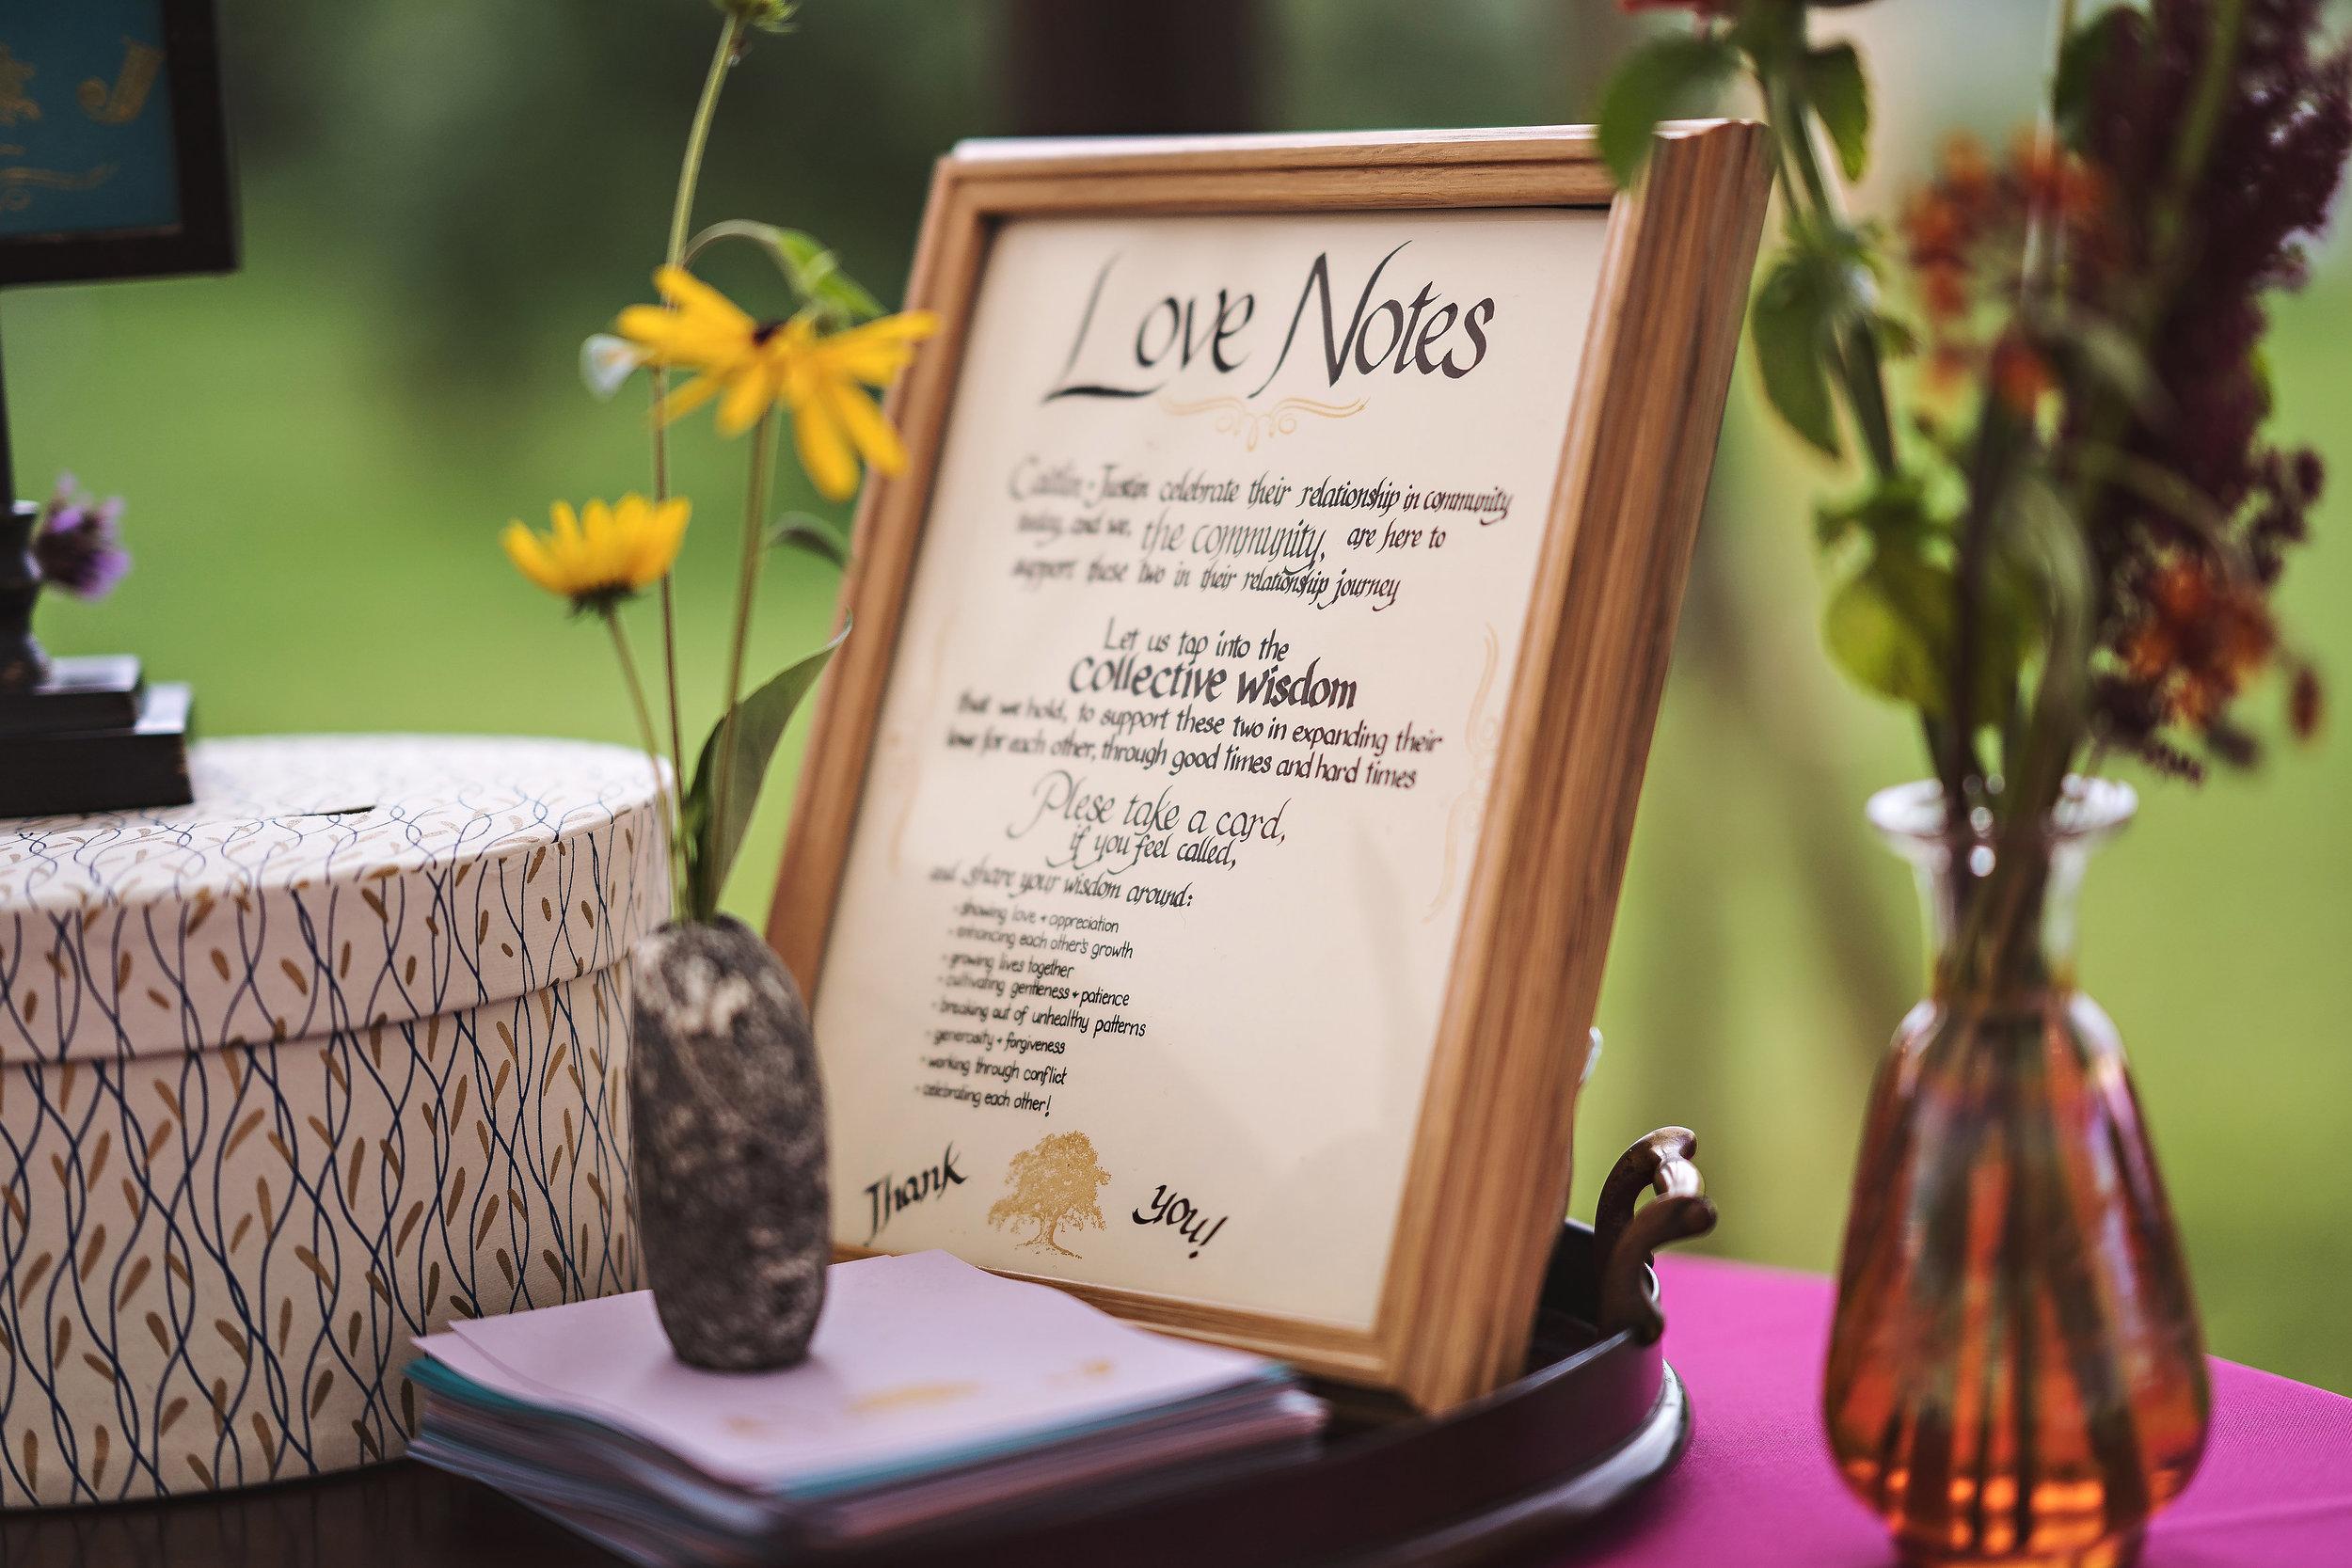 upstate-ny-wedding-jove-meyer-events-inbal-sivan-051.jpg